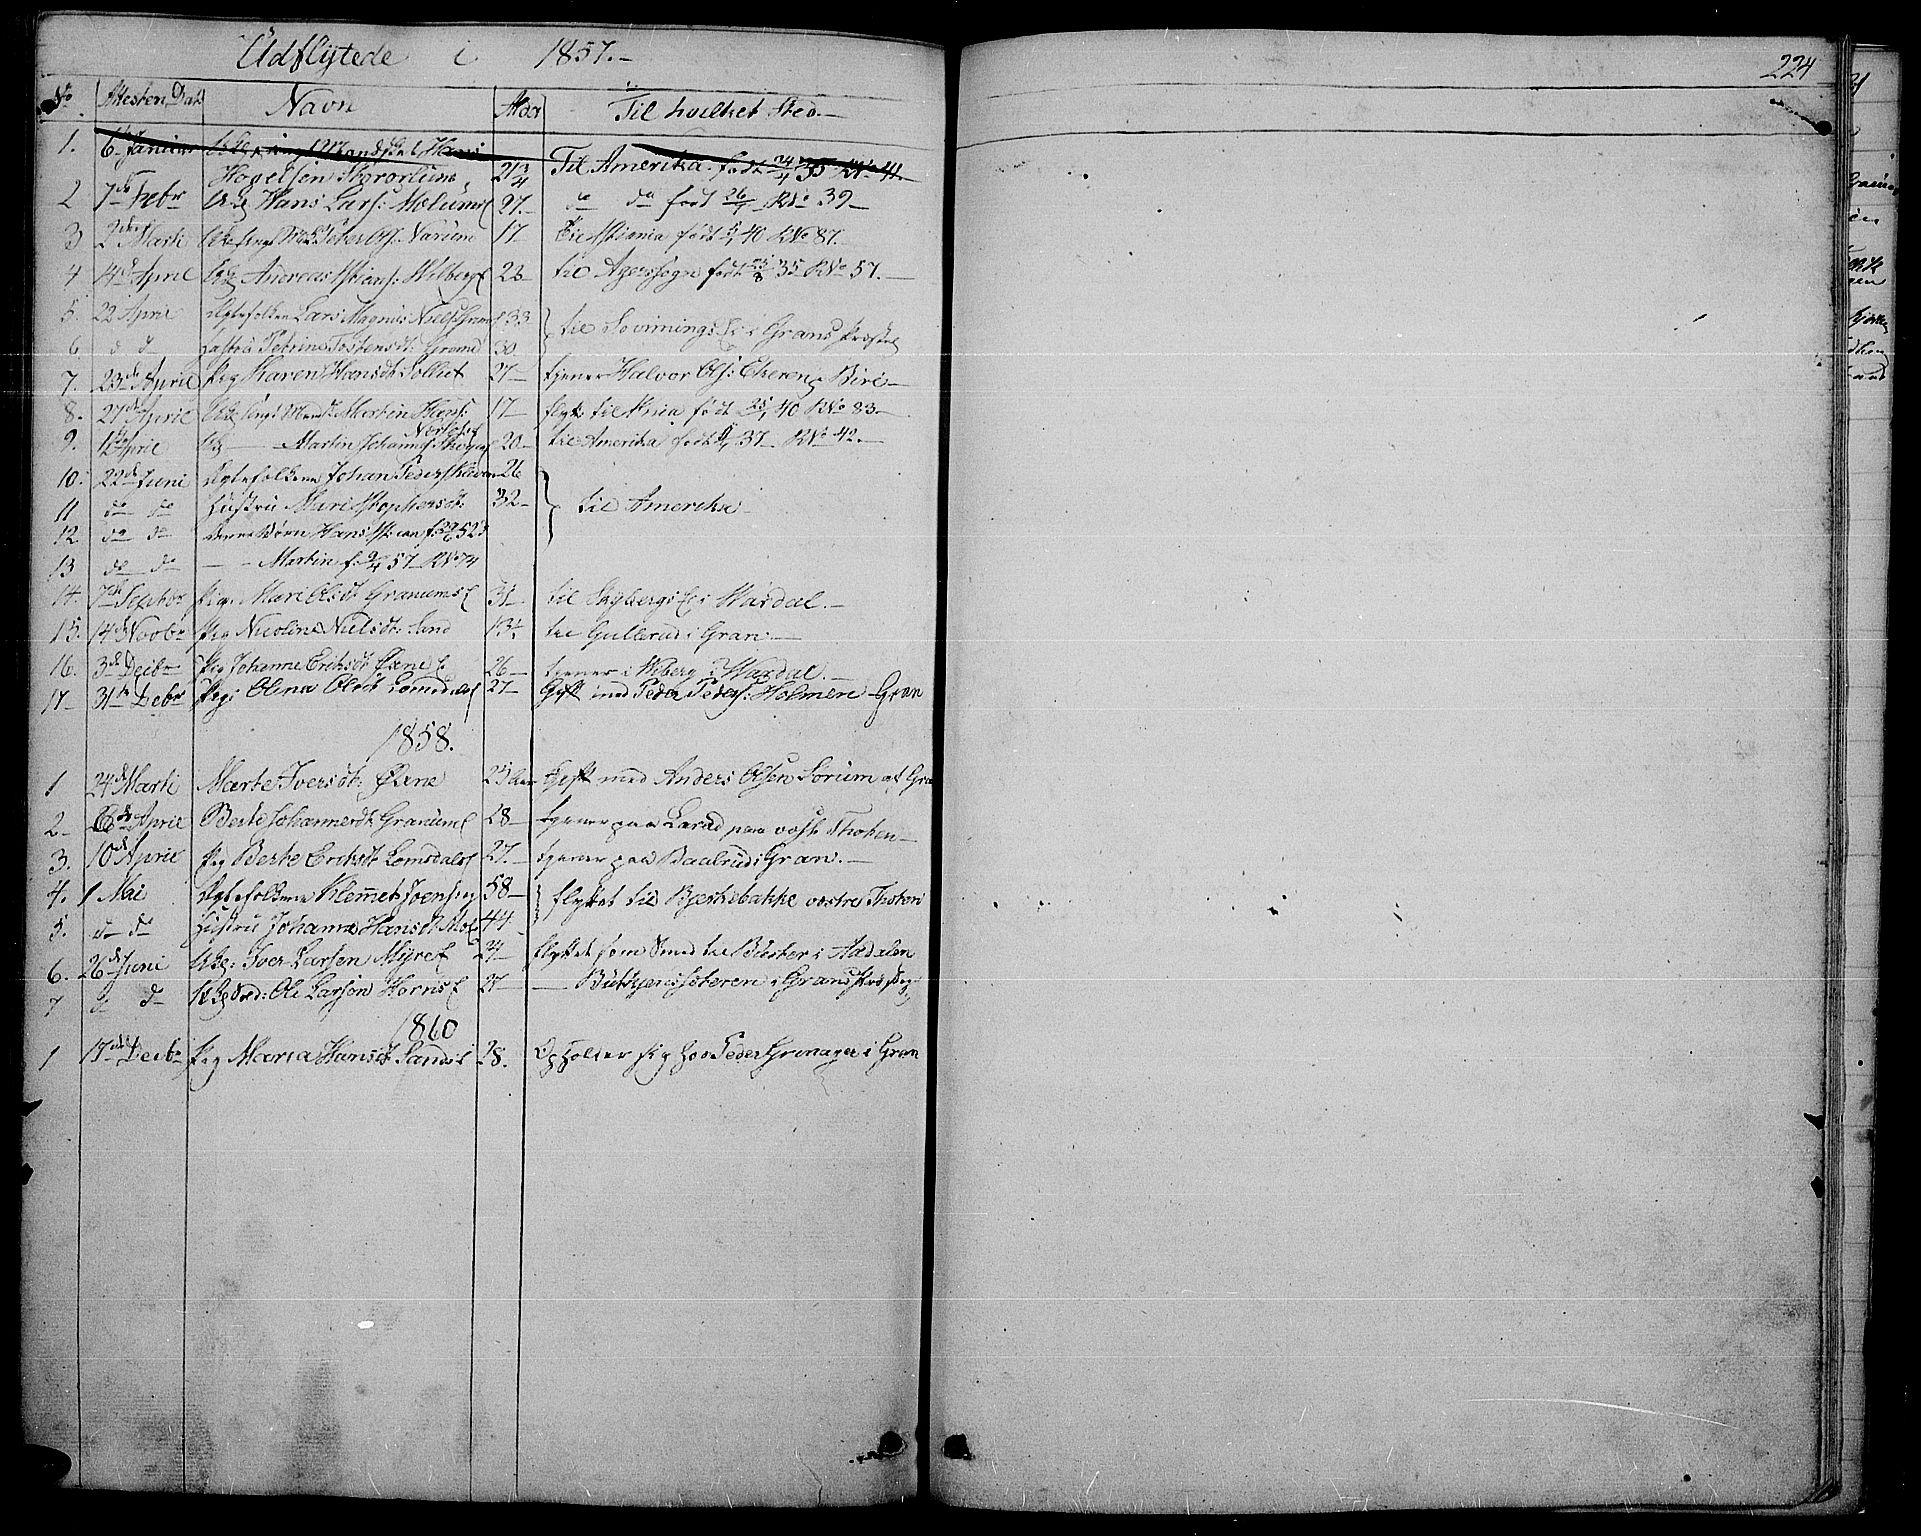 SAH, Søndre Land prestekontor, L/L0001: Klokkerbok nr. 1, 1849-1883, s. 224